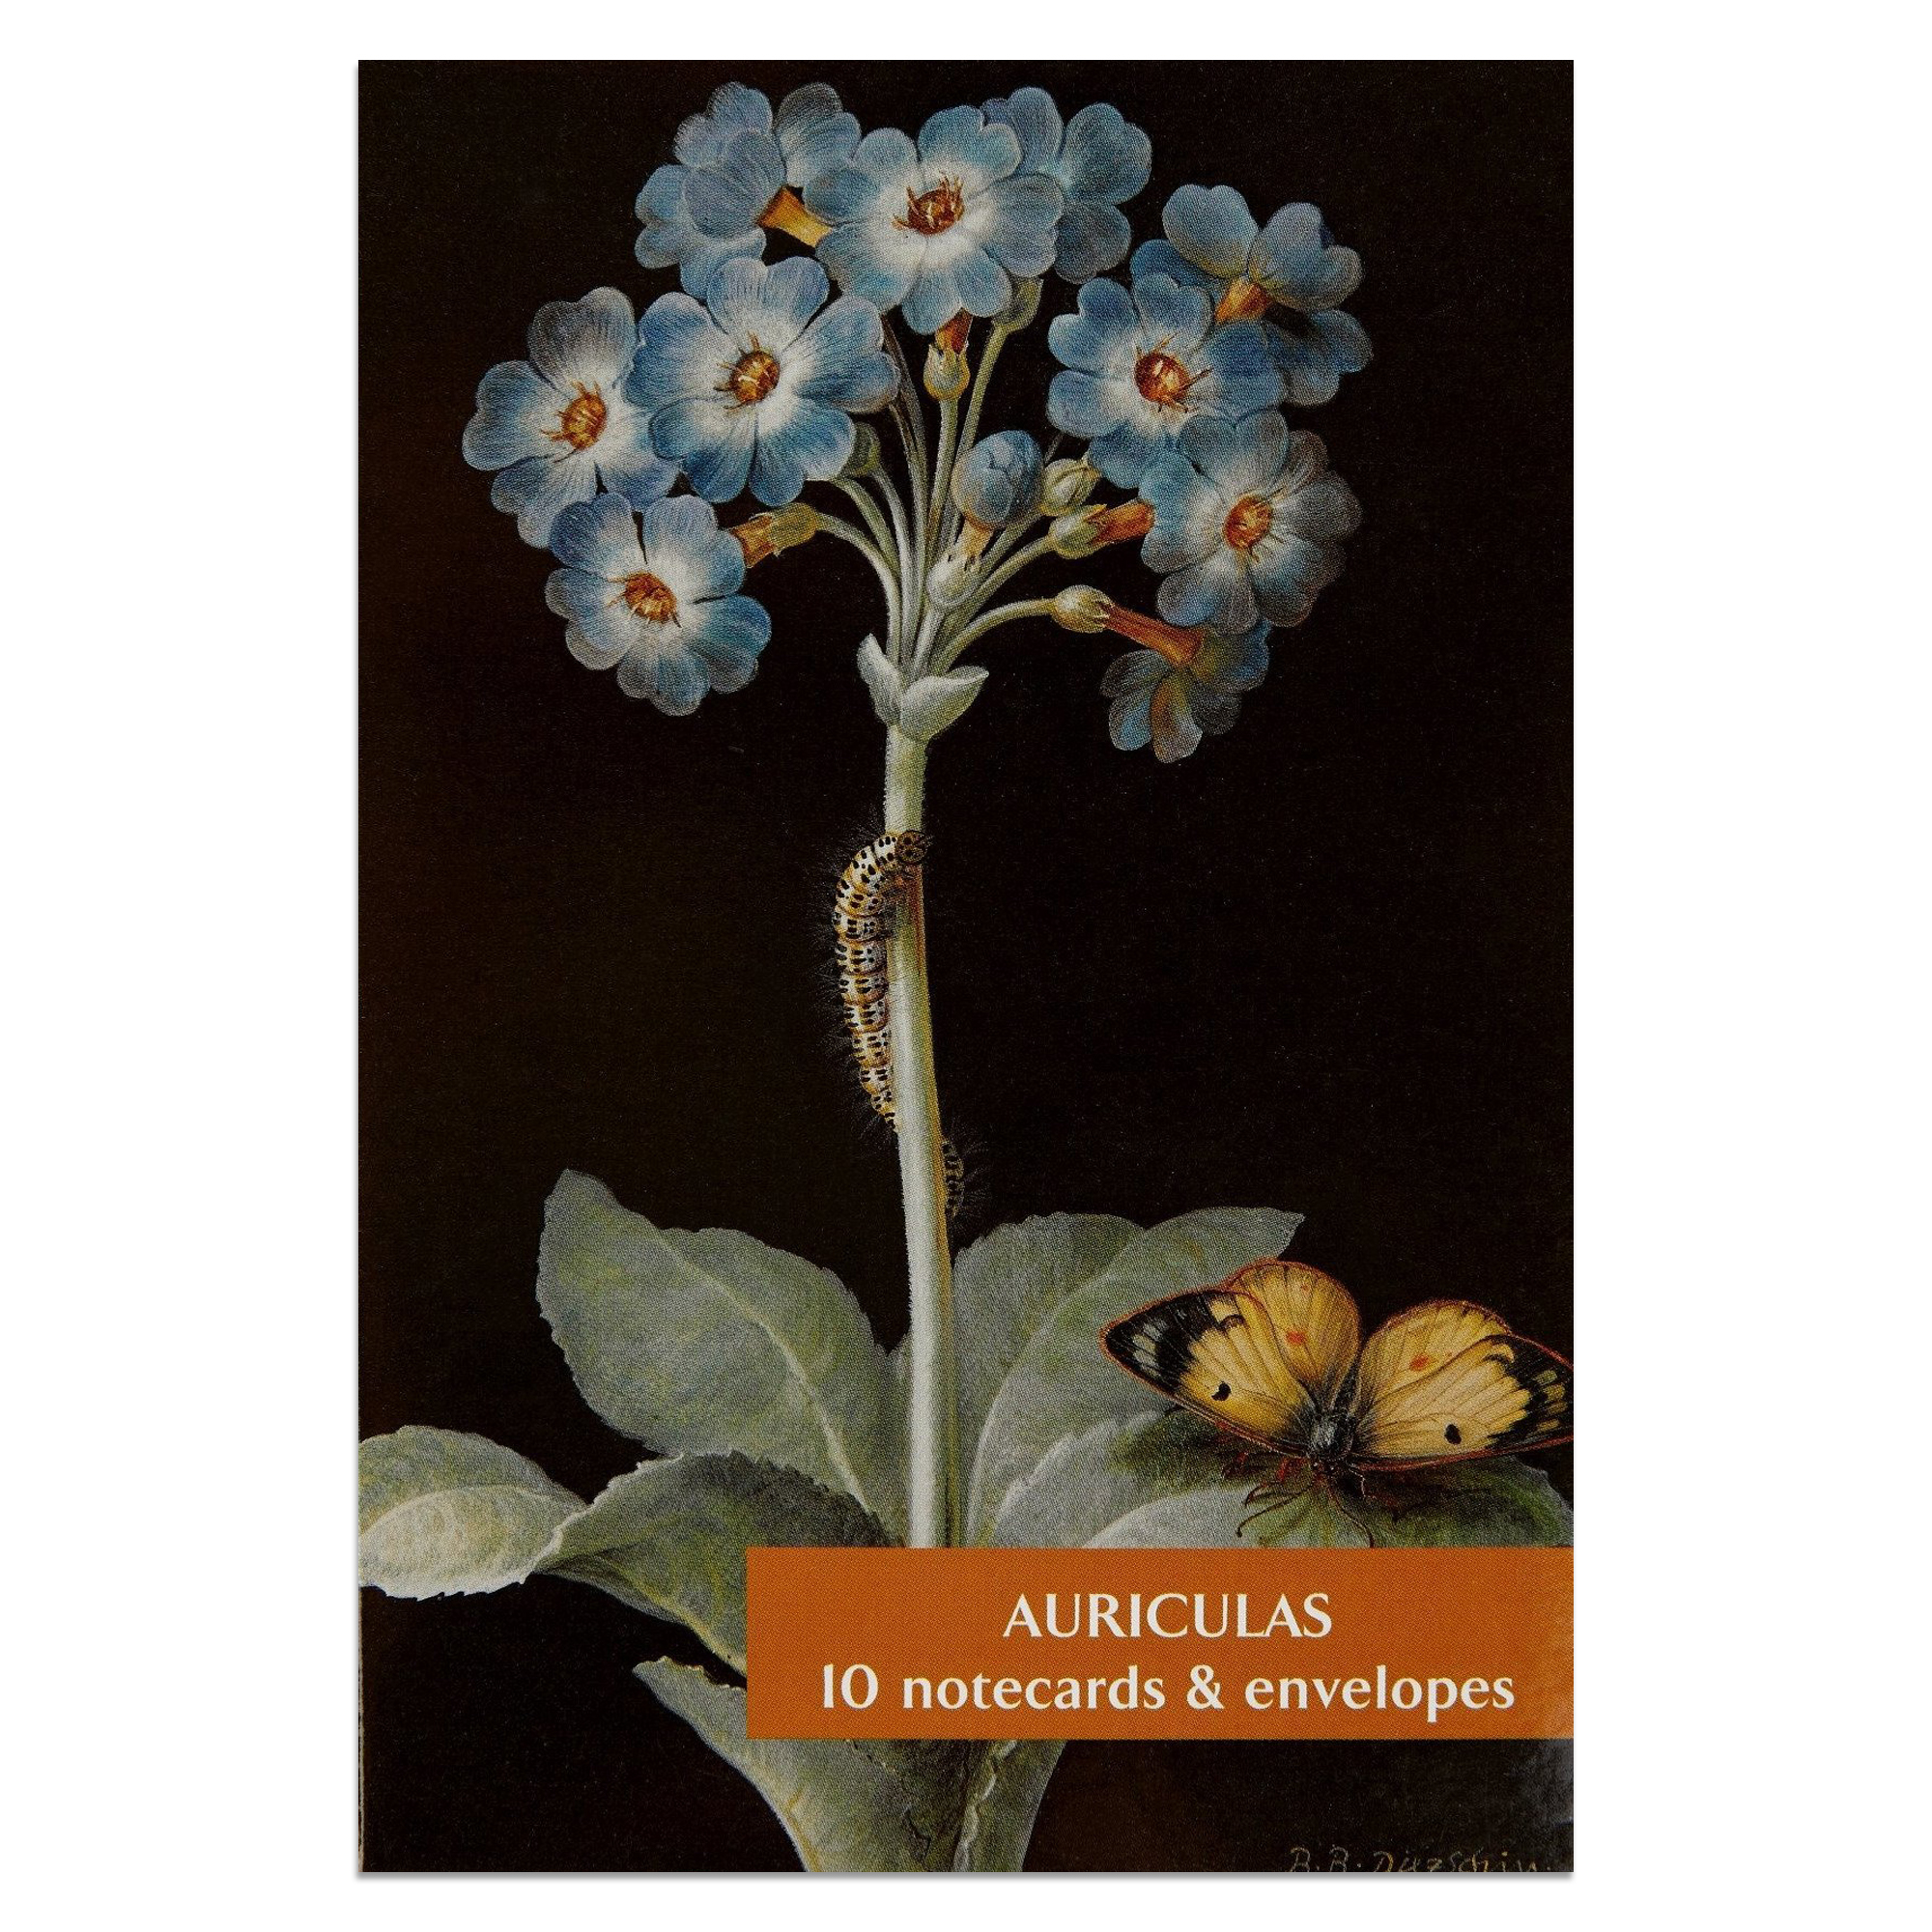 Auriculas notecard set (10 cards)